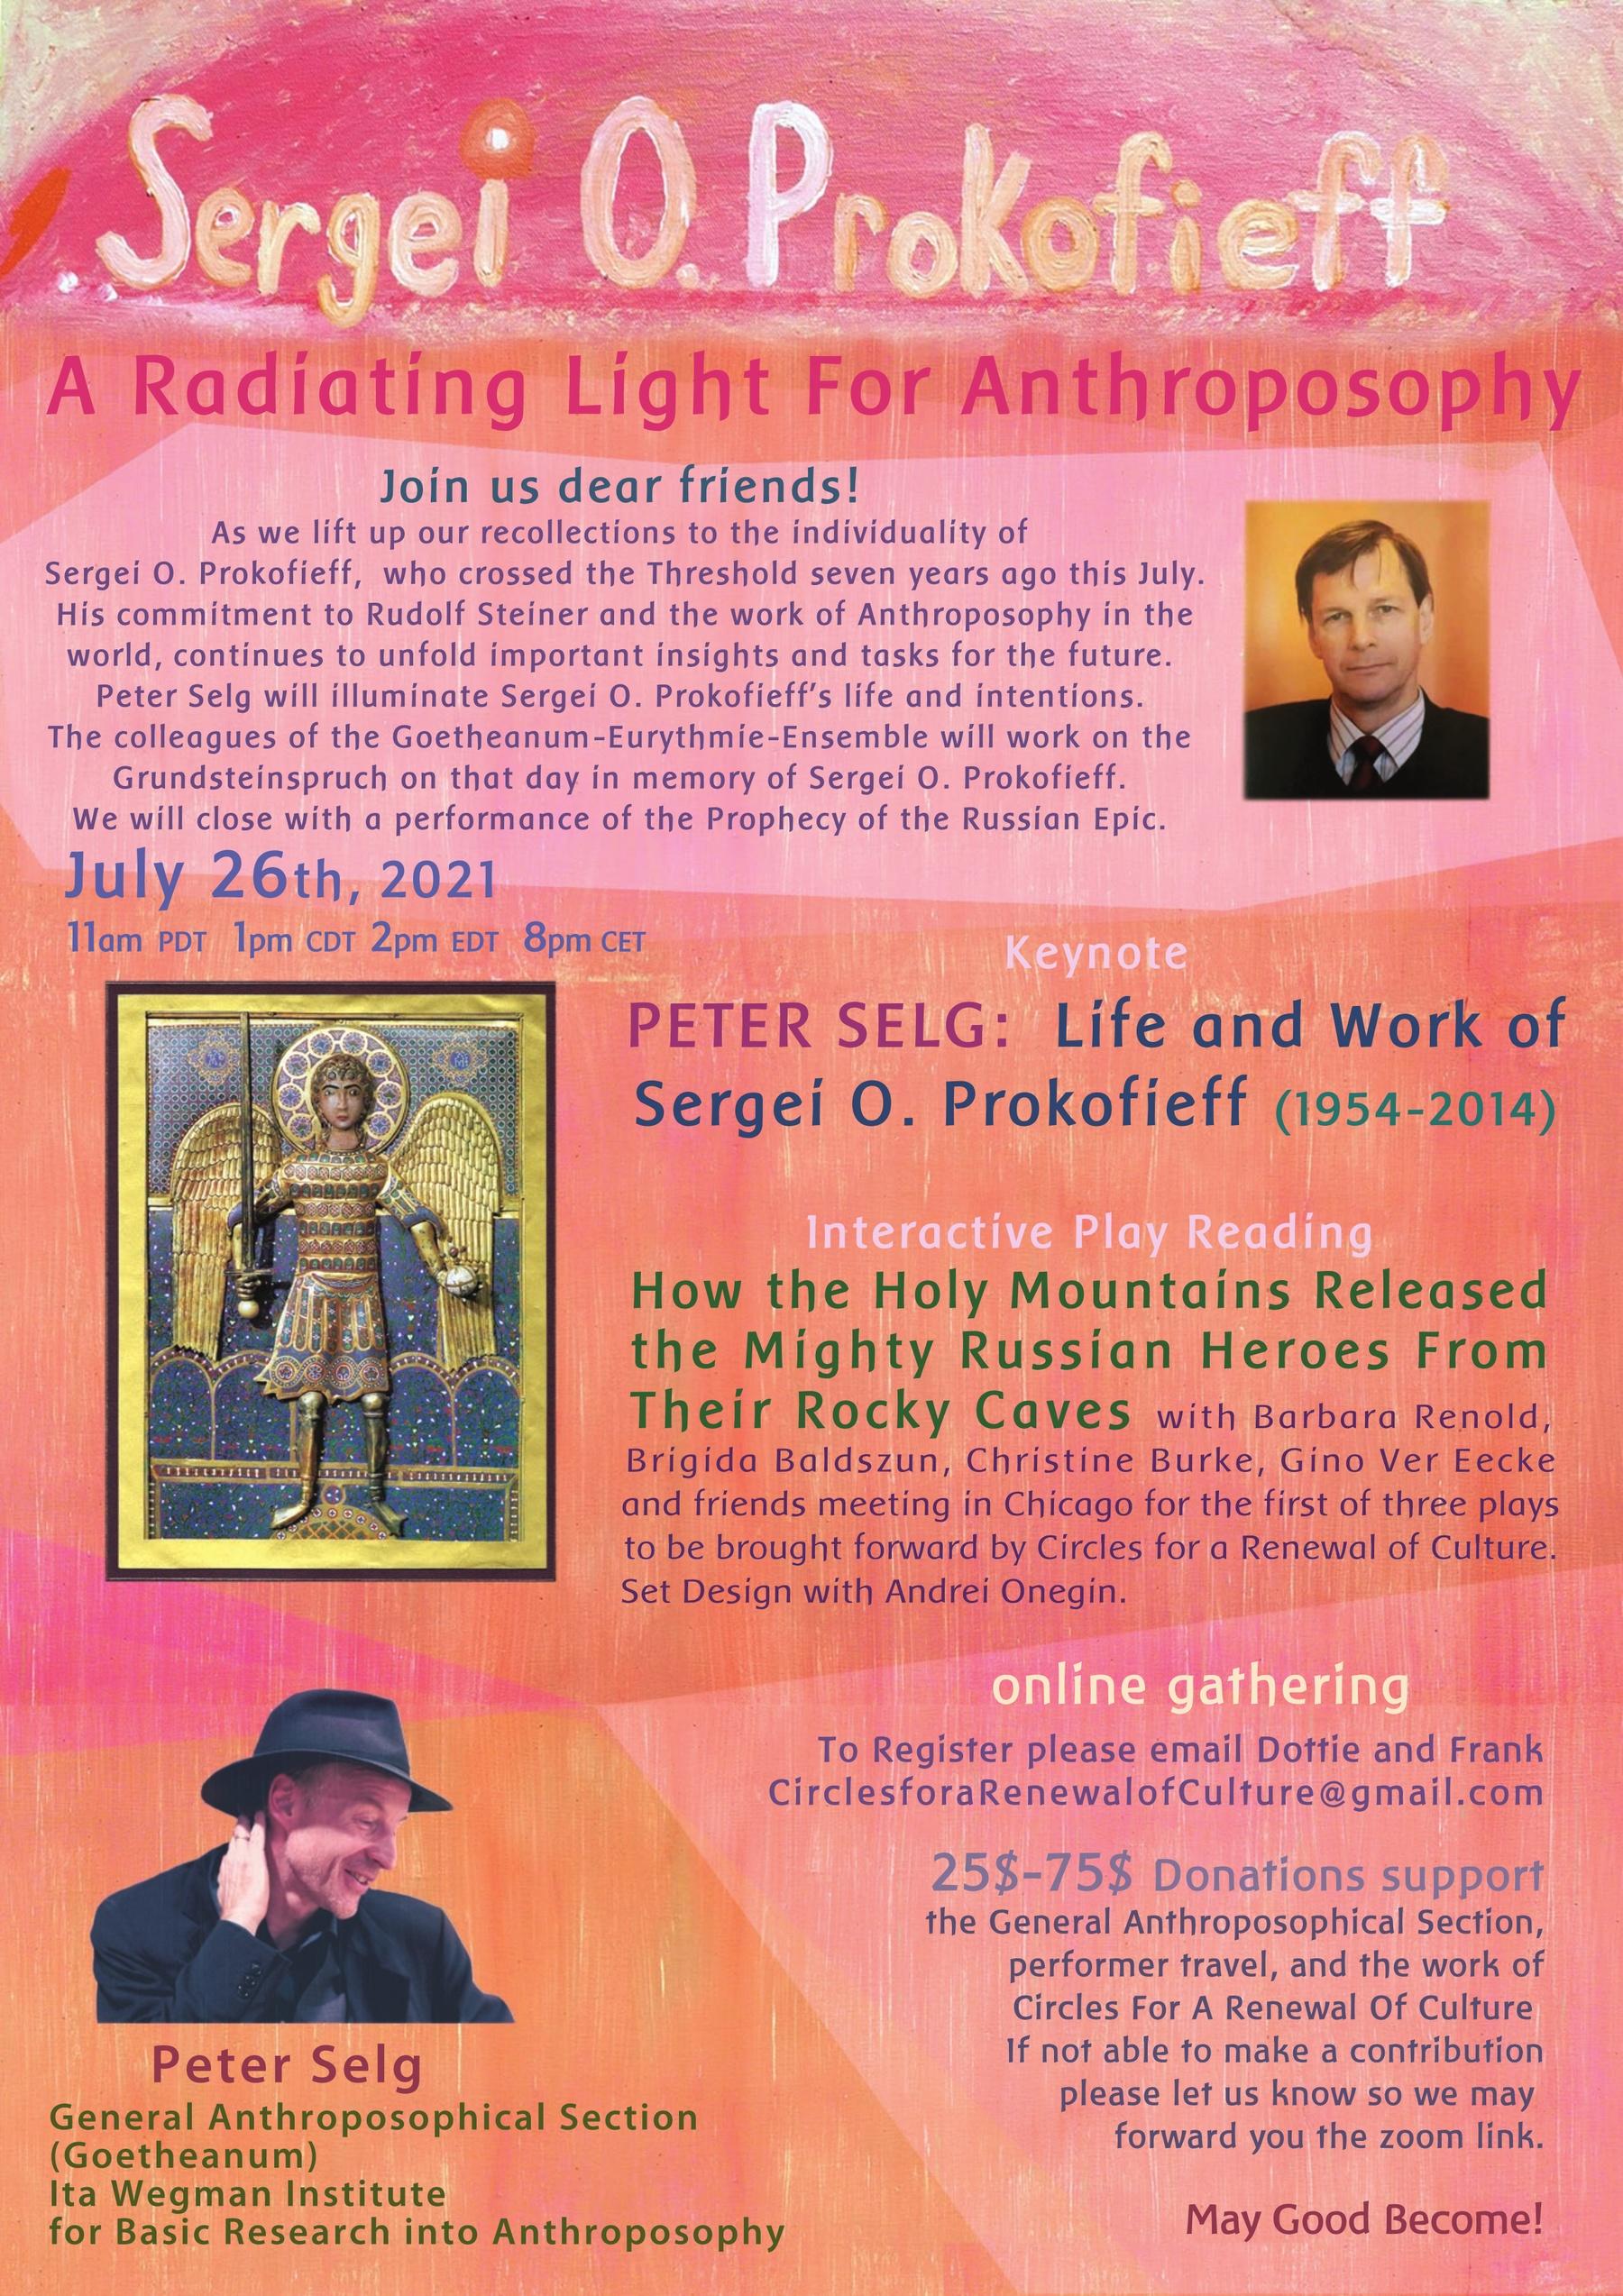 Prokofieff Radiating event